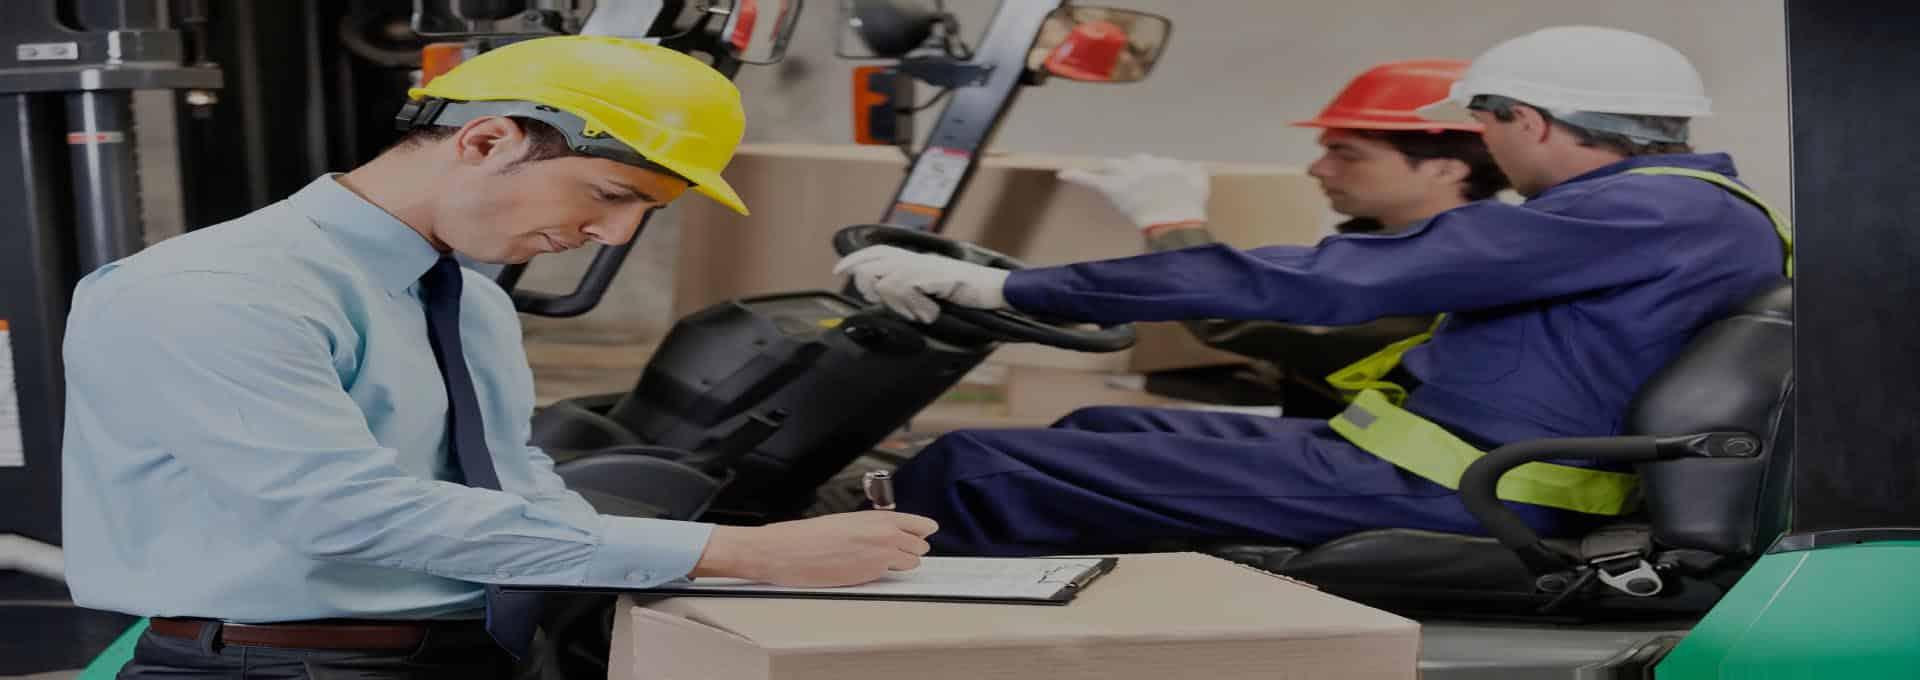 Forklift Training Worthing